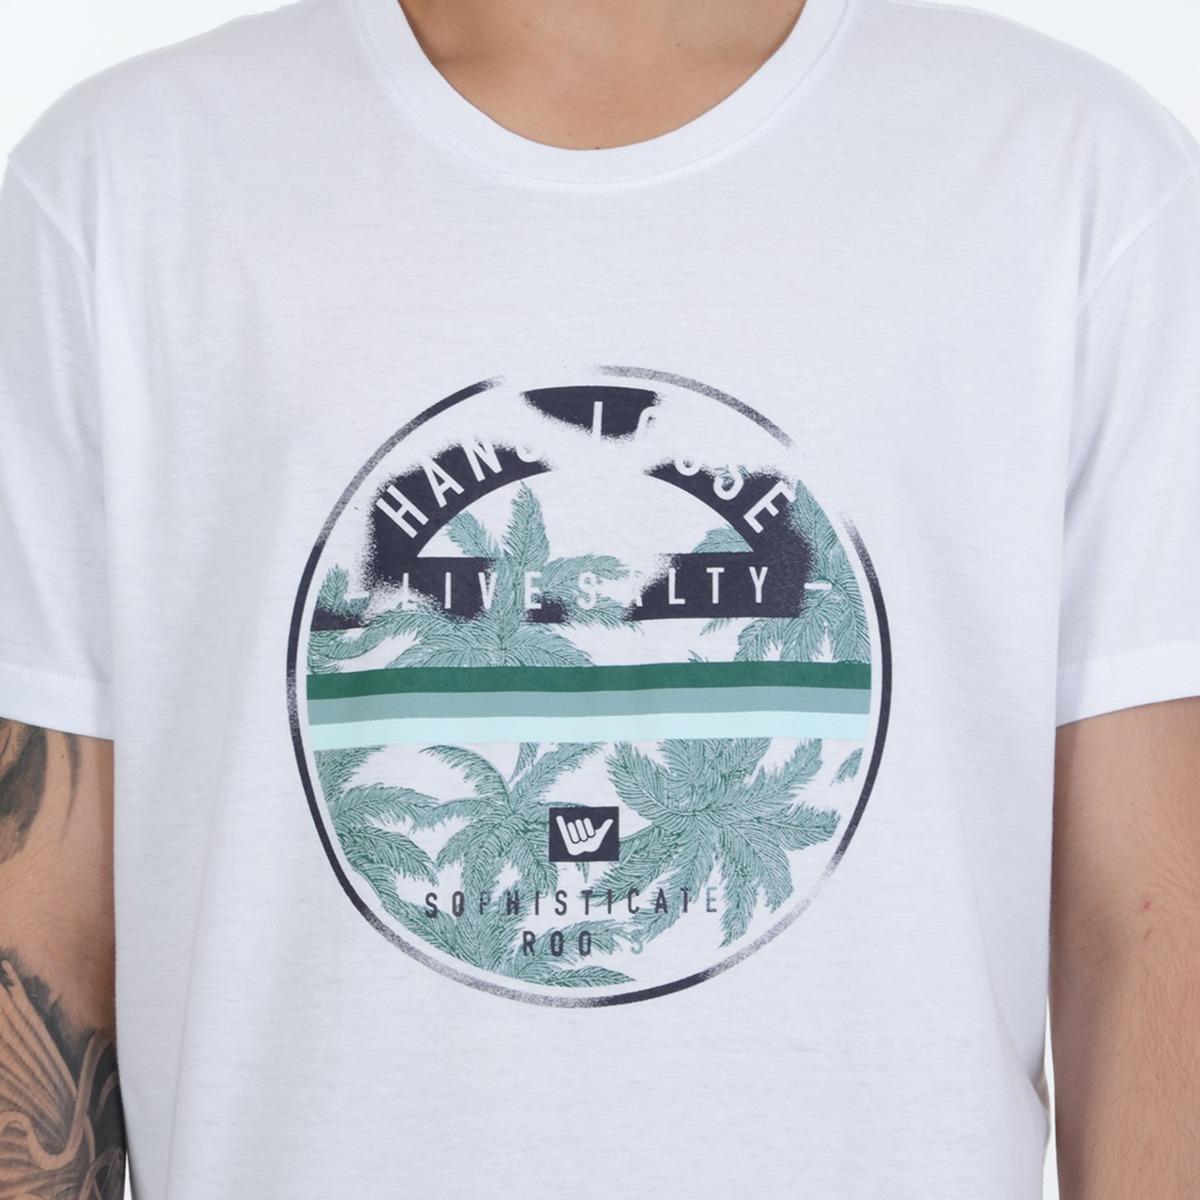 098de9a1d7 camiseta hang loose lapalm. Carregando zoom.